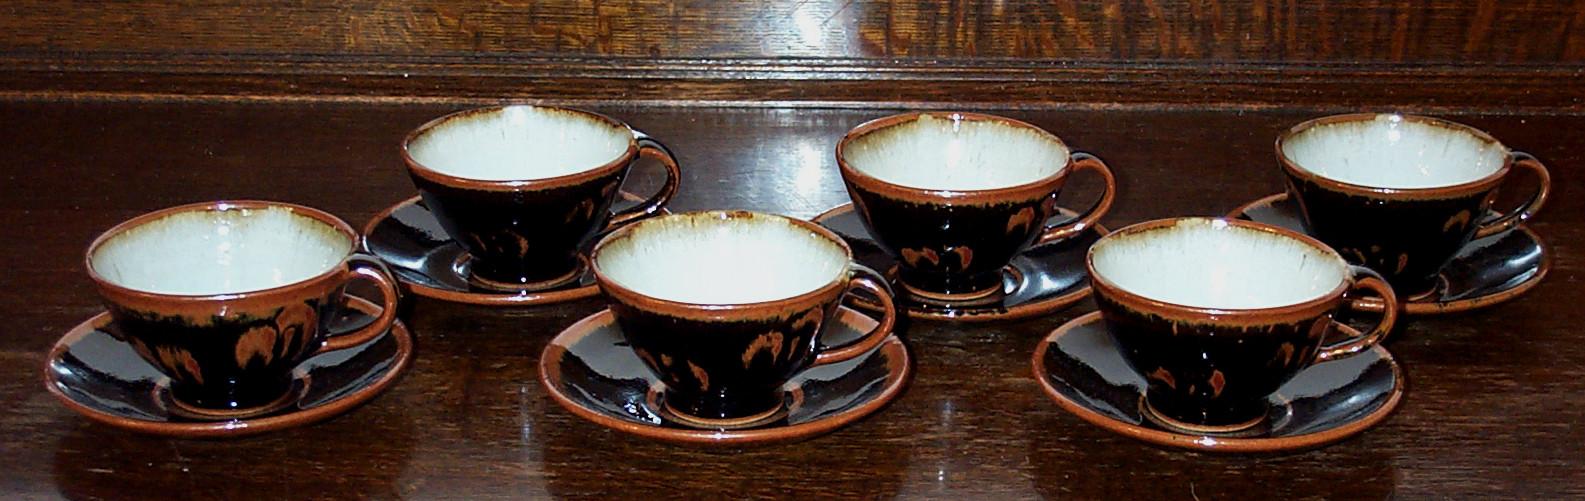 862-867  cups & saucers.jpg